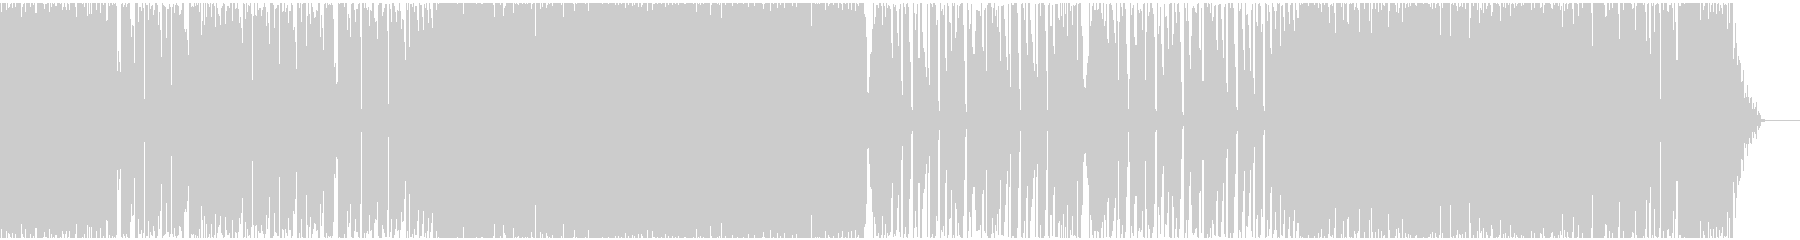 【EDM】トランス、ロング10の未再生の波形